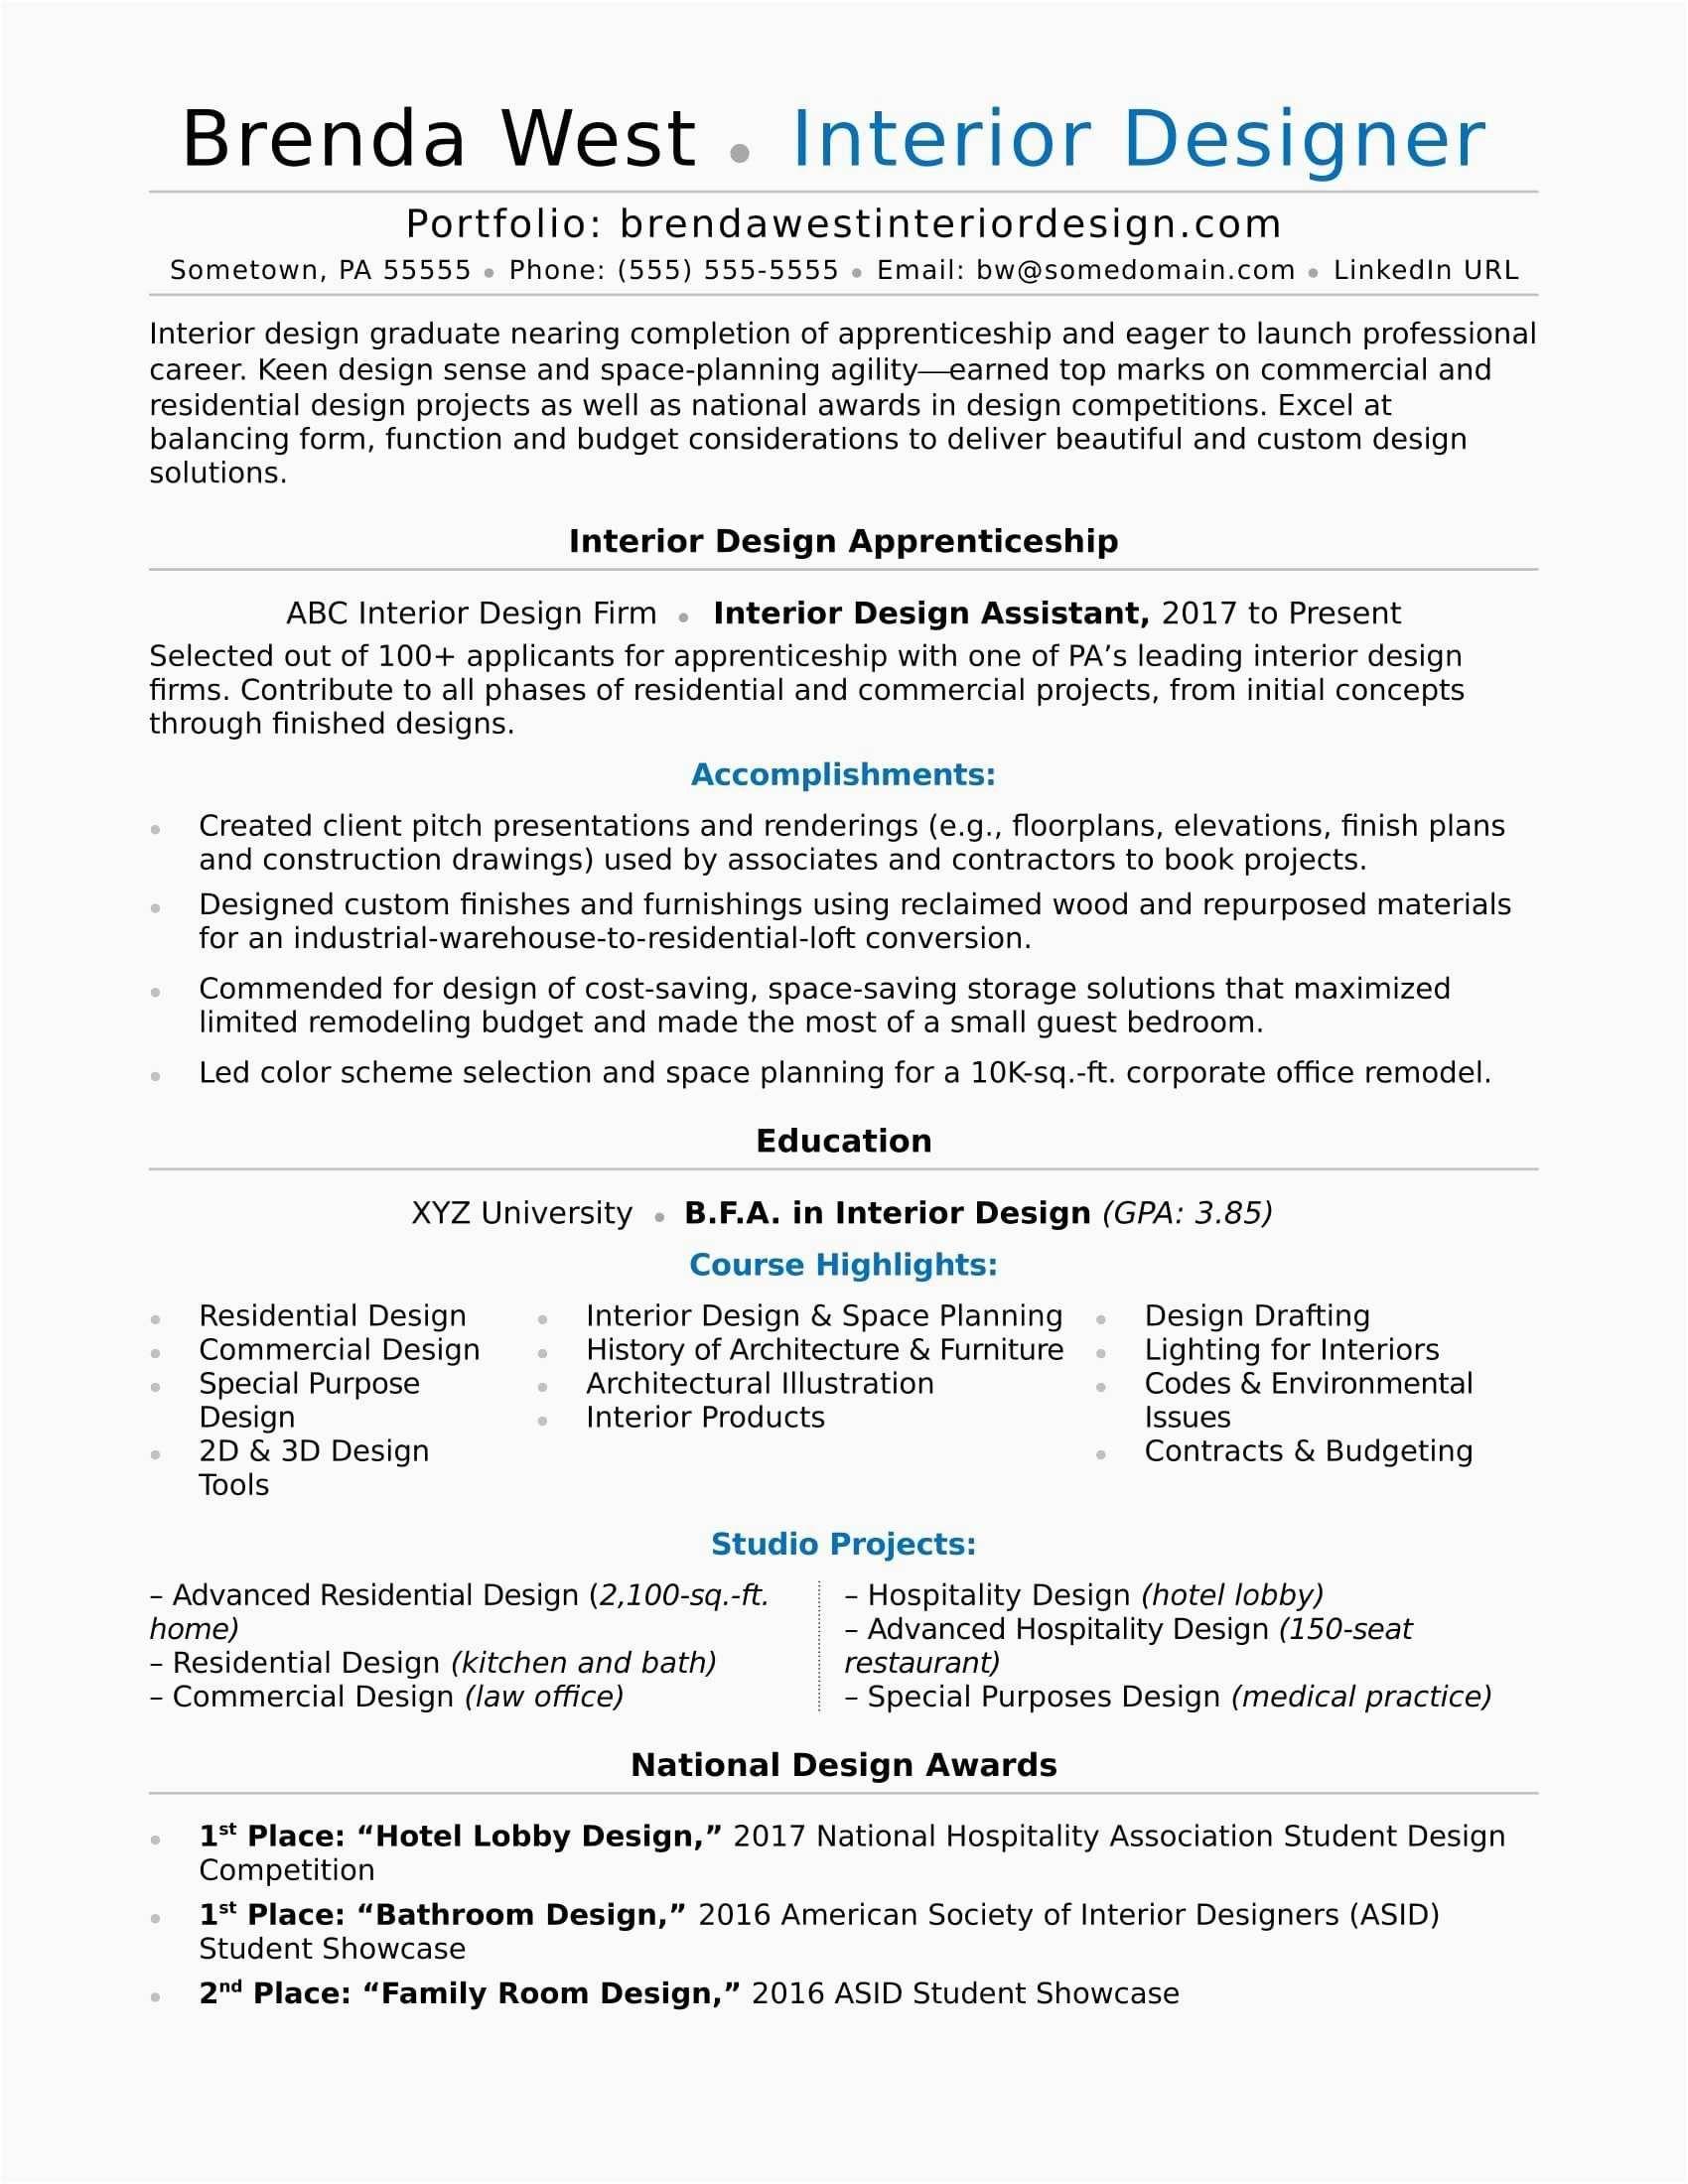 Resume Templates Unique Collection 30 Best Resume